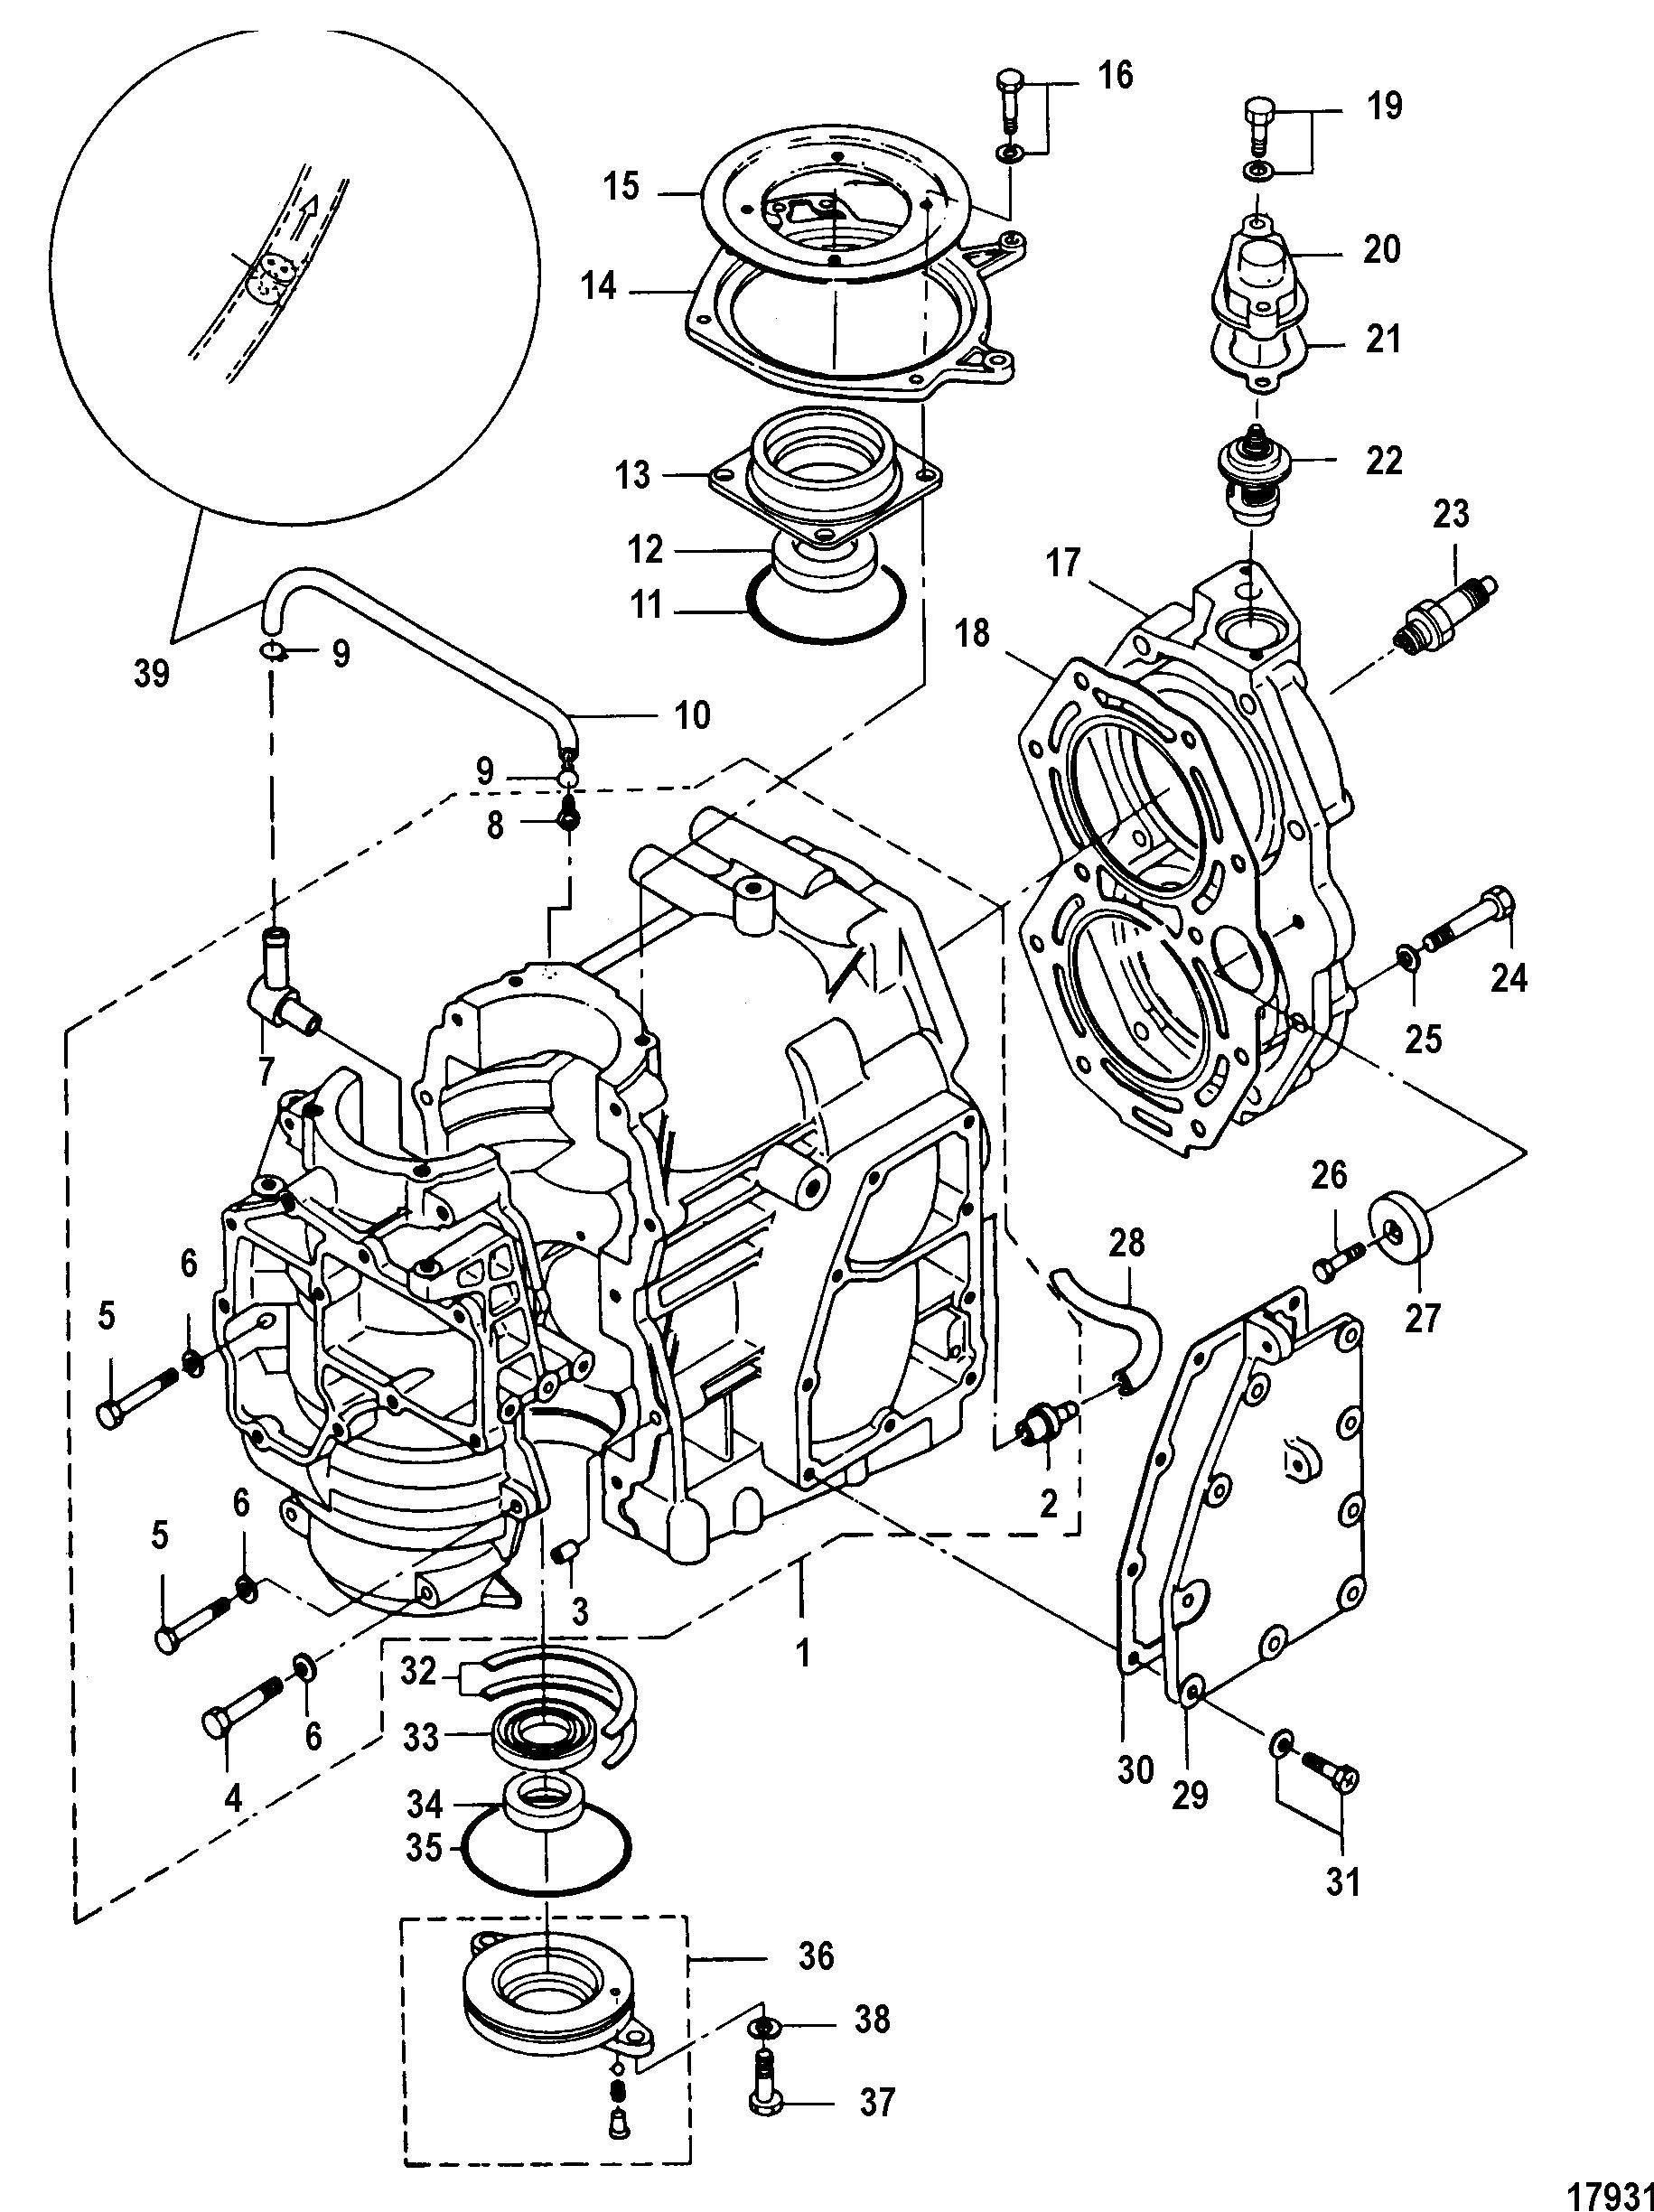 Mercury 25 Jet 2 Cyl2strokeinternational. Mercury 25 Jet 2 Cyl2strokeinternational 0n088578 Up Cylinder Block. Mercury. Mercury 2 Stroke Motor Diagram At Scoala.co